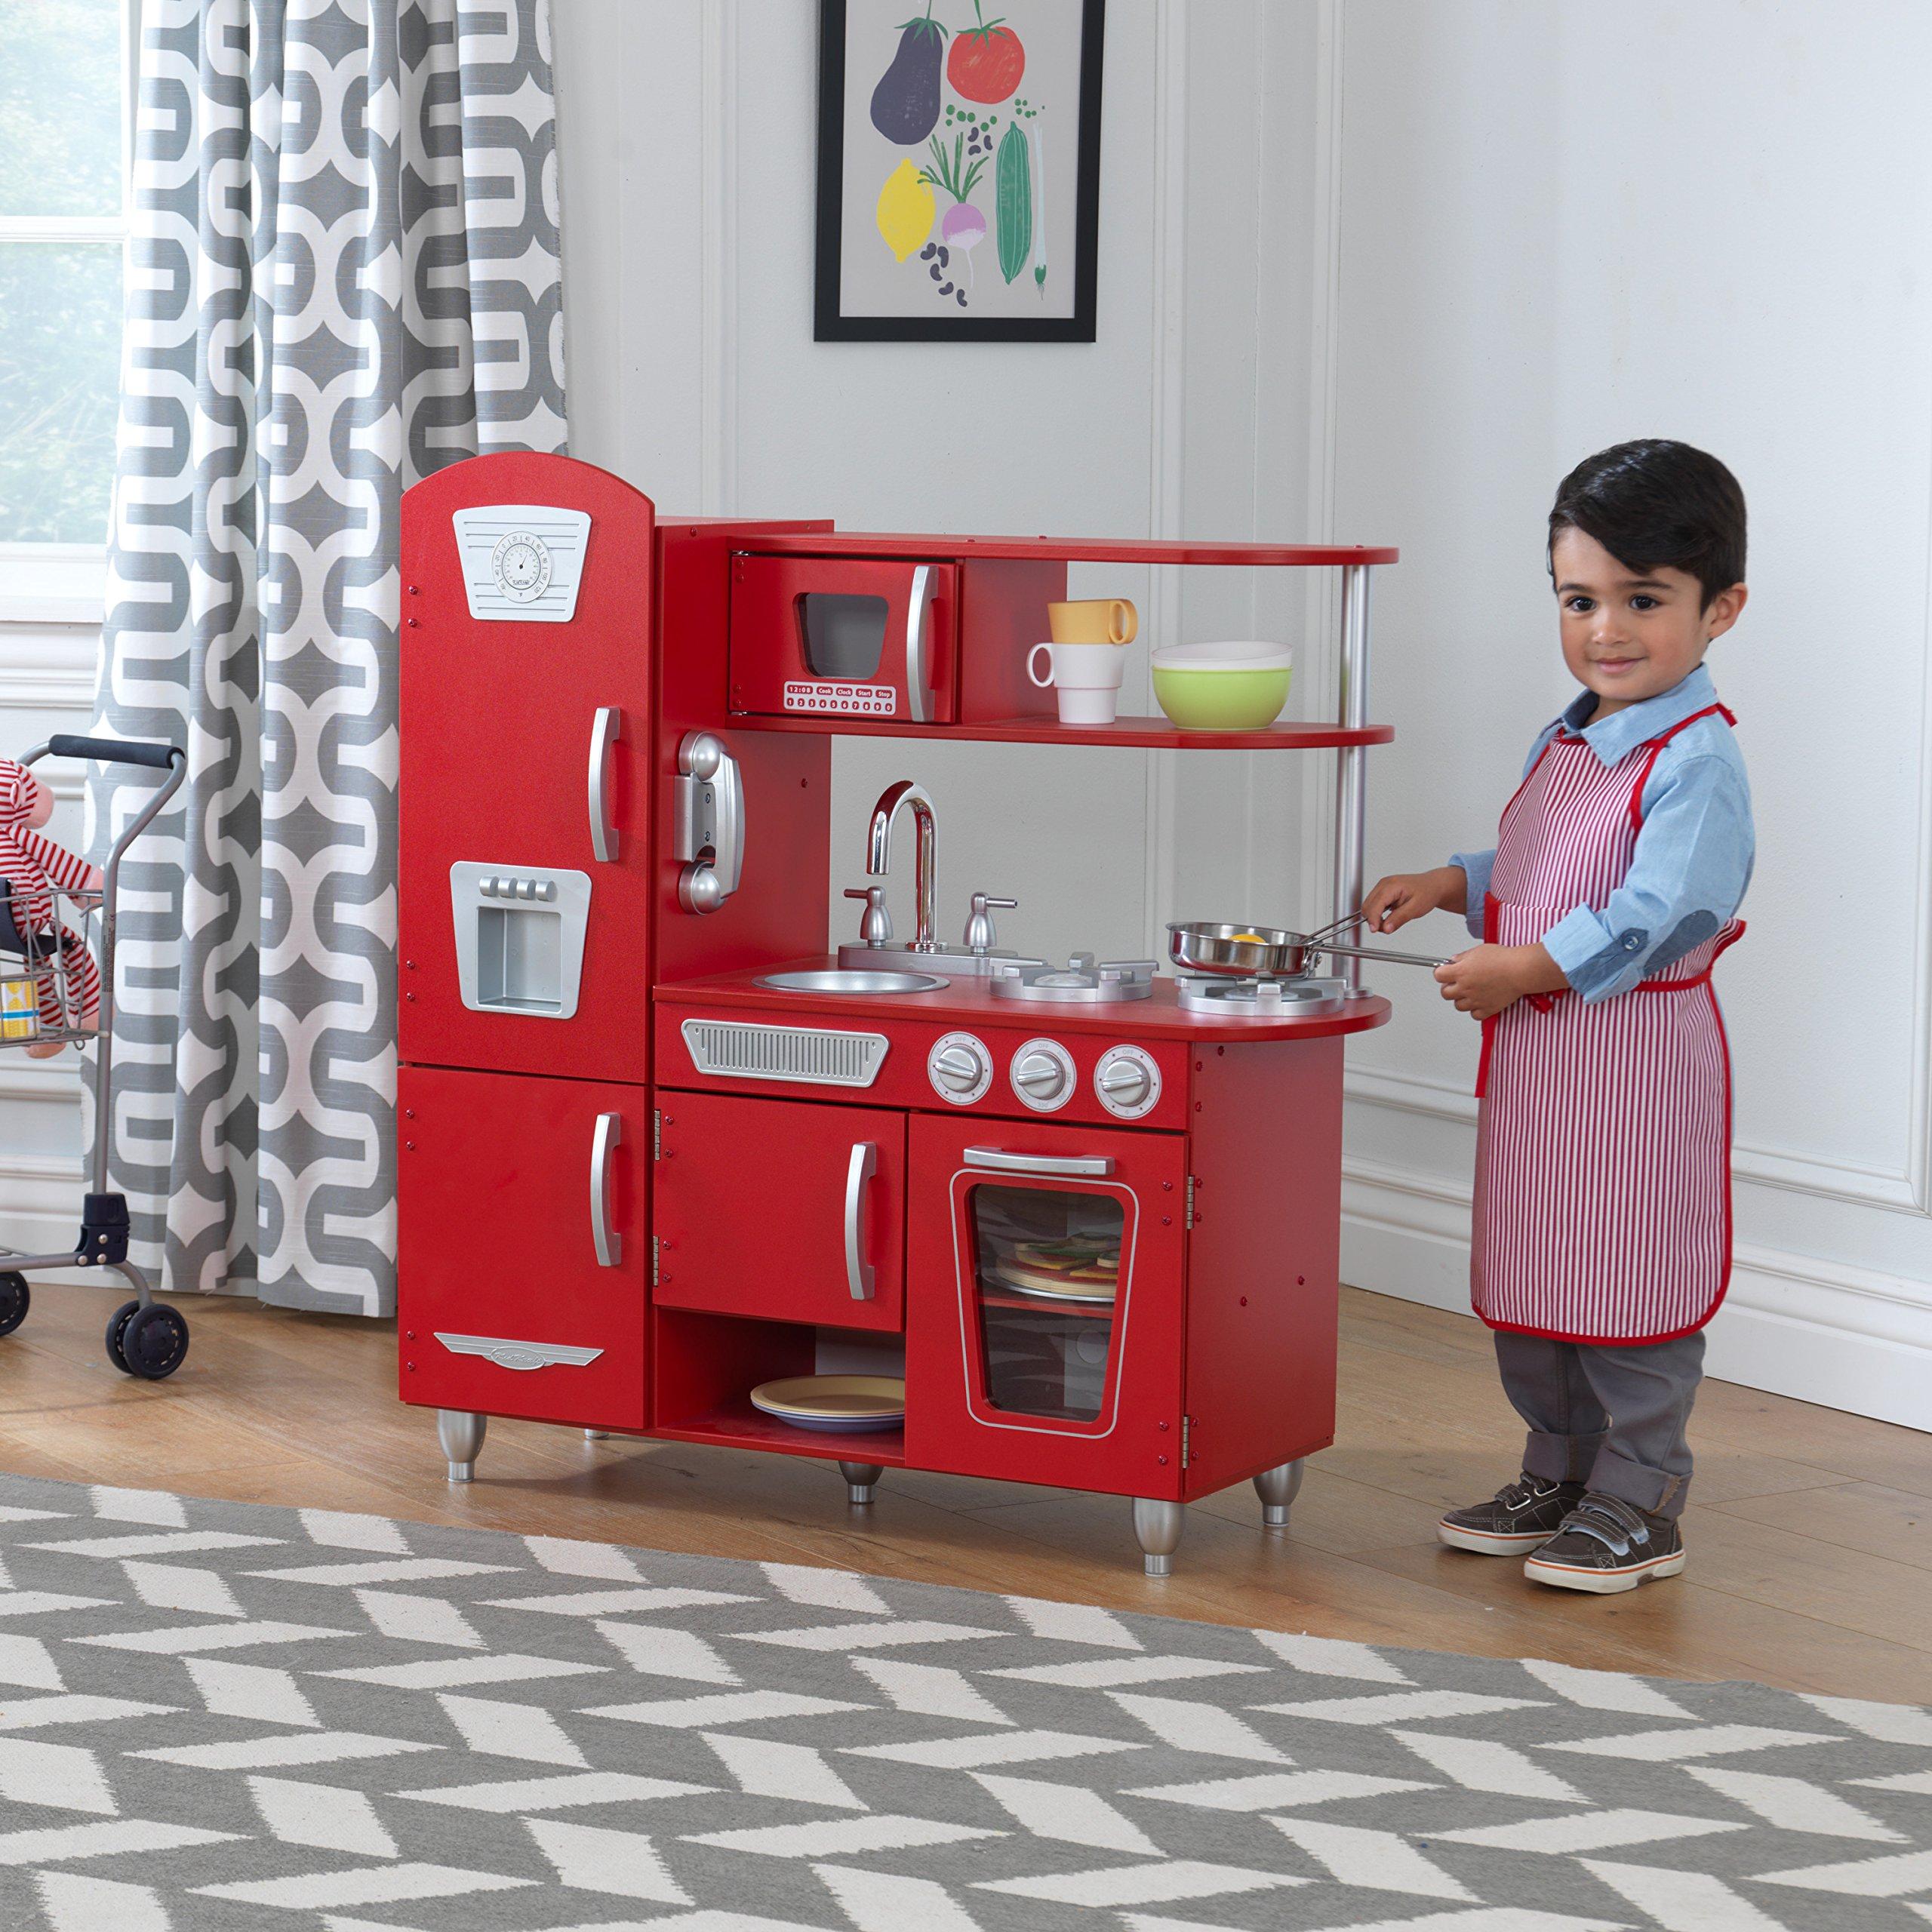 KidKraft Vintage Play Kitchen - Red by KidKraft (Image #5)